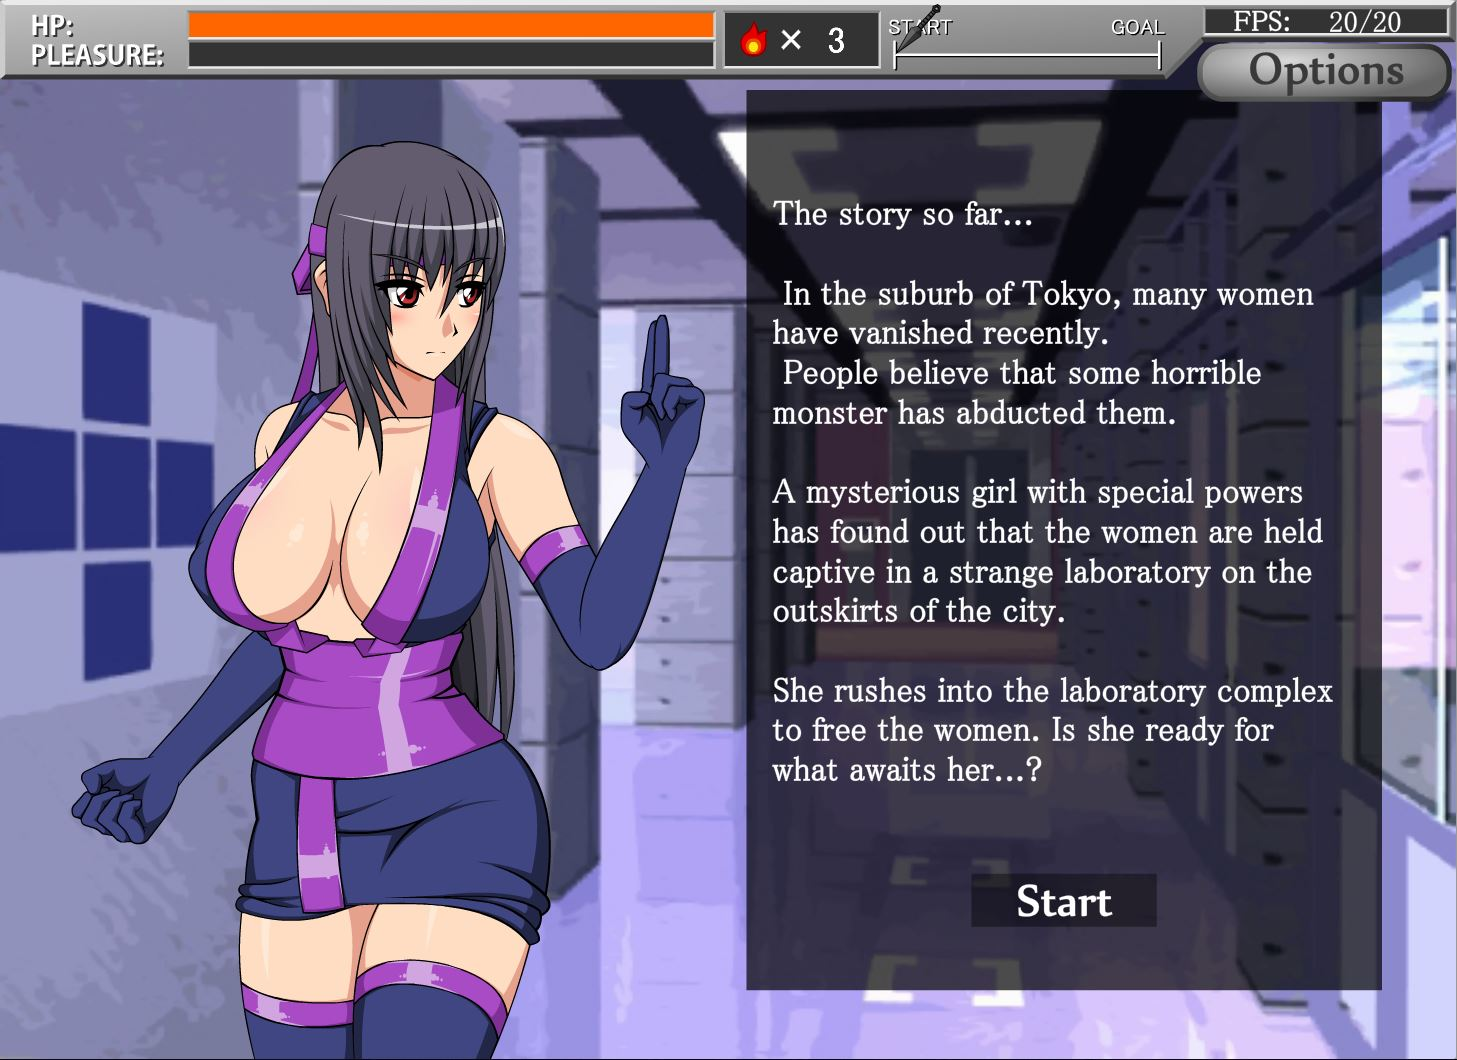 ComDotGame - Shinobi Girl